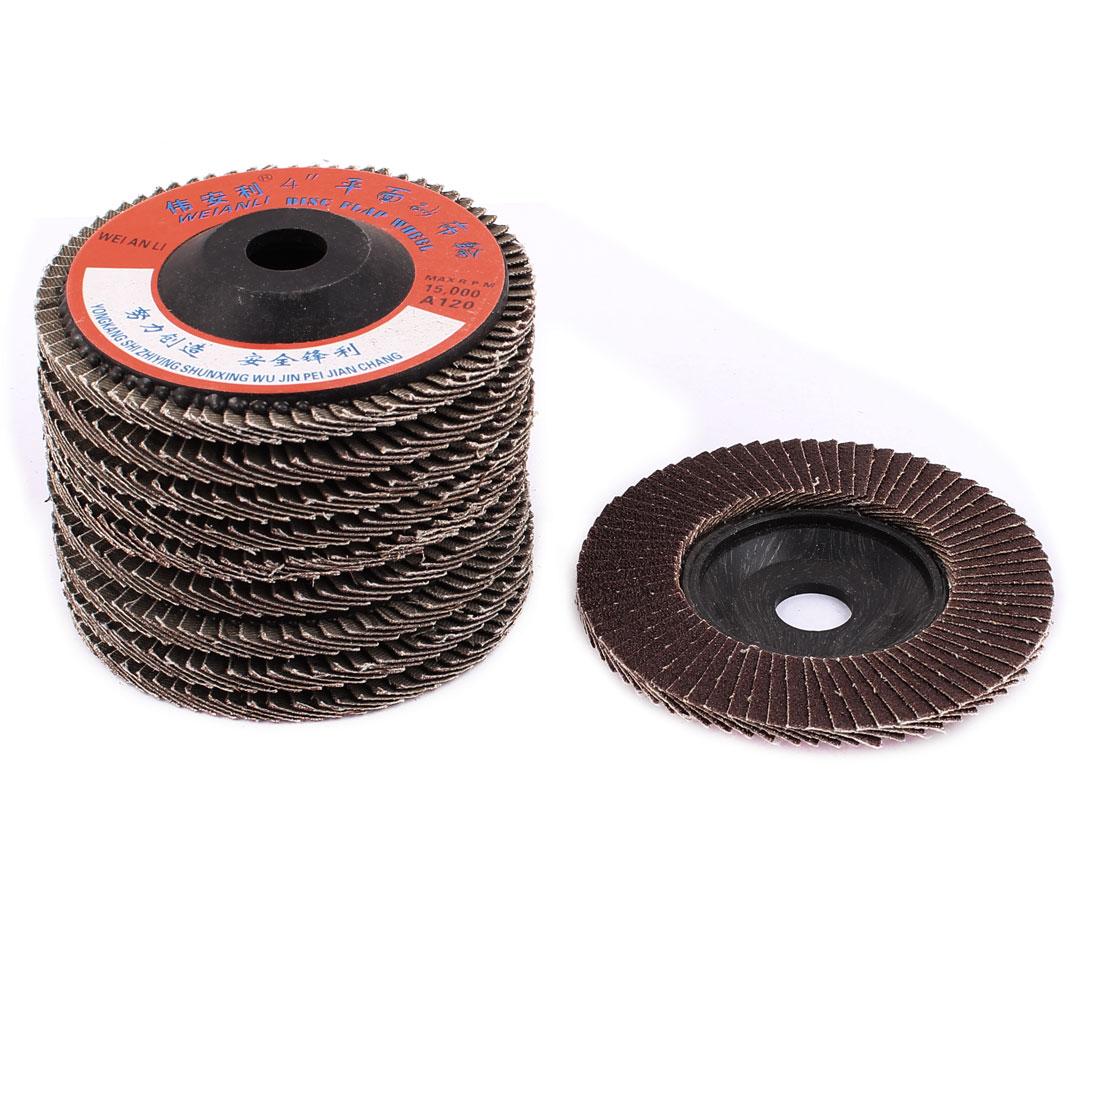 10PCS Coated Abrasive Flap Sanding Discs Buffing Wheel 16mm x 100mm